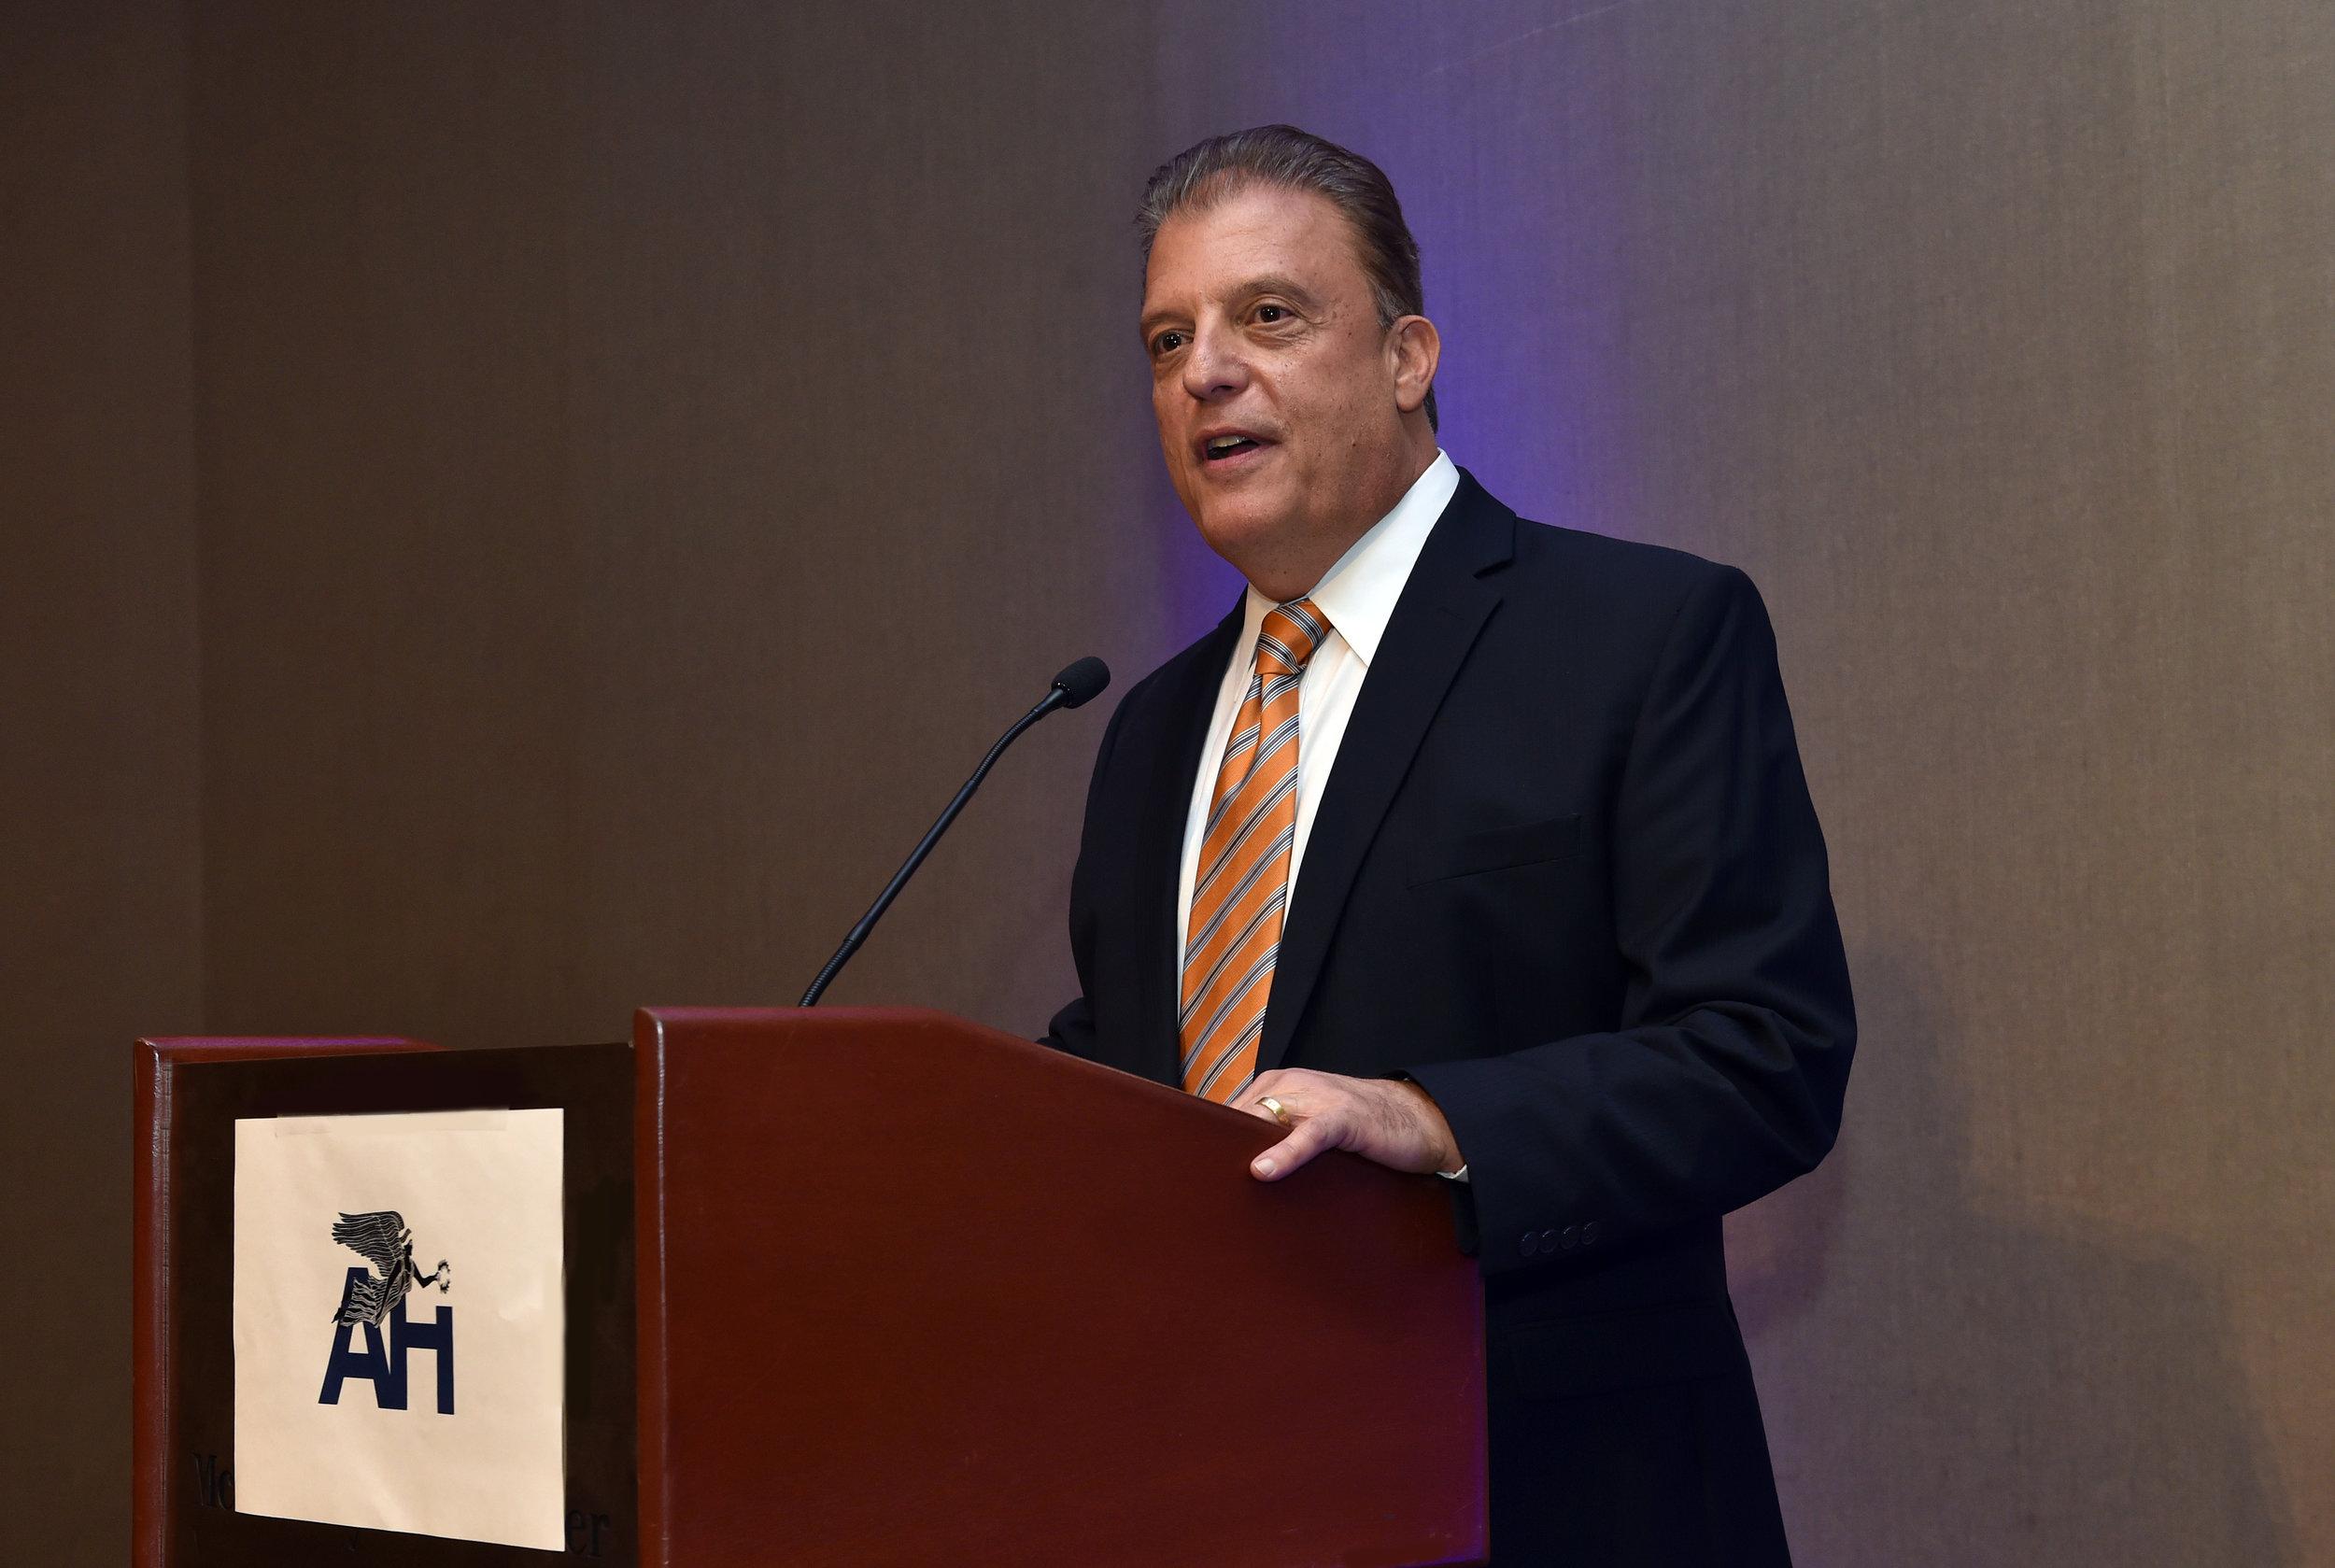 Larry Michael, Senior Vice President of Media at the Washington Redskins.